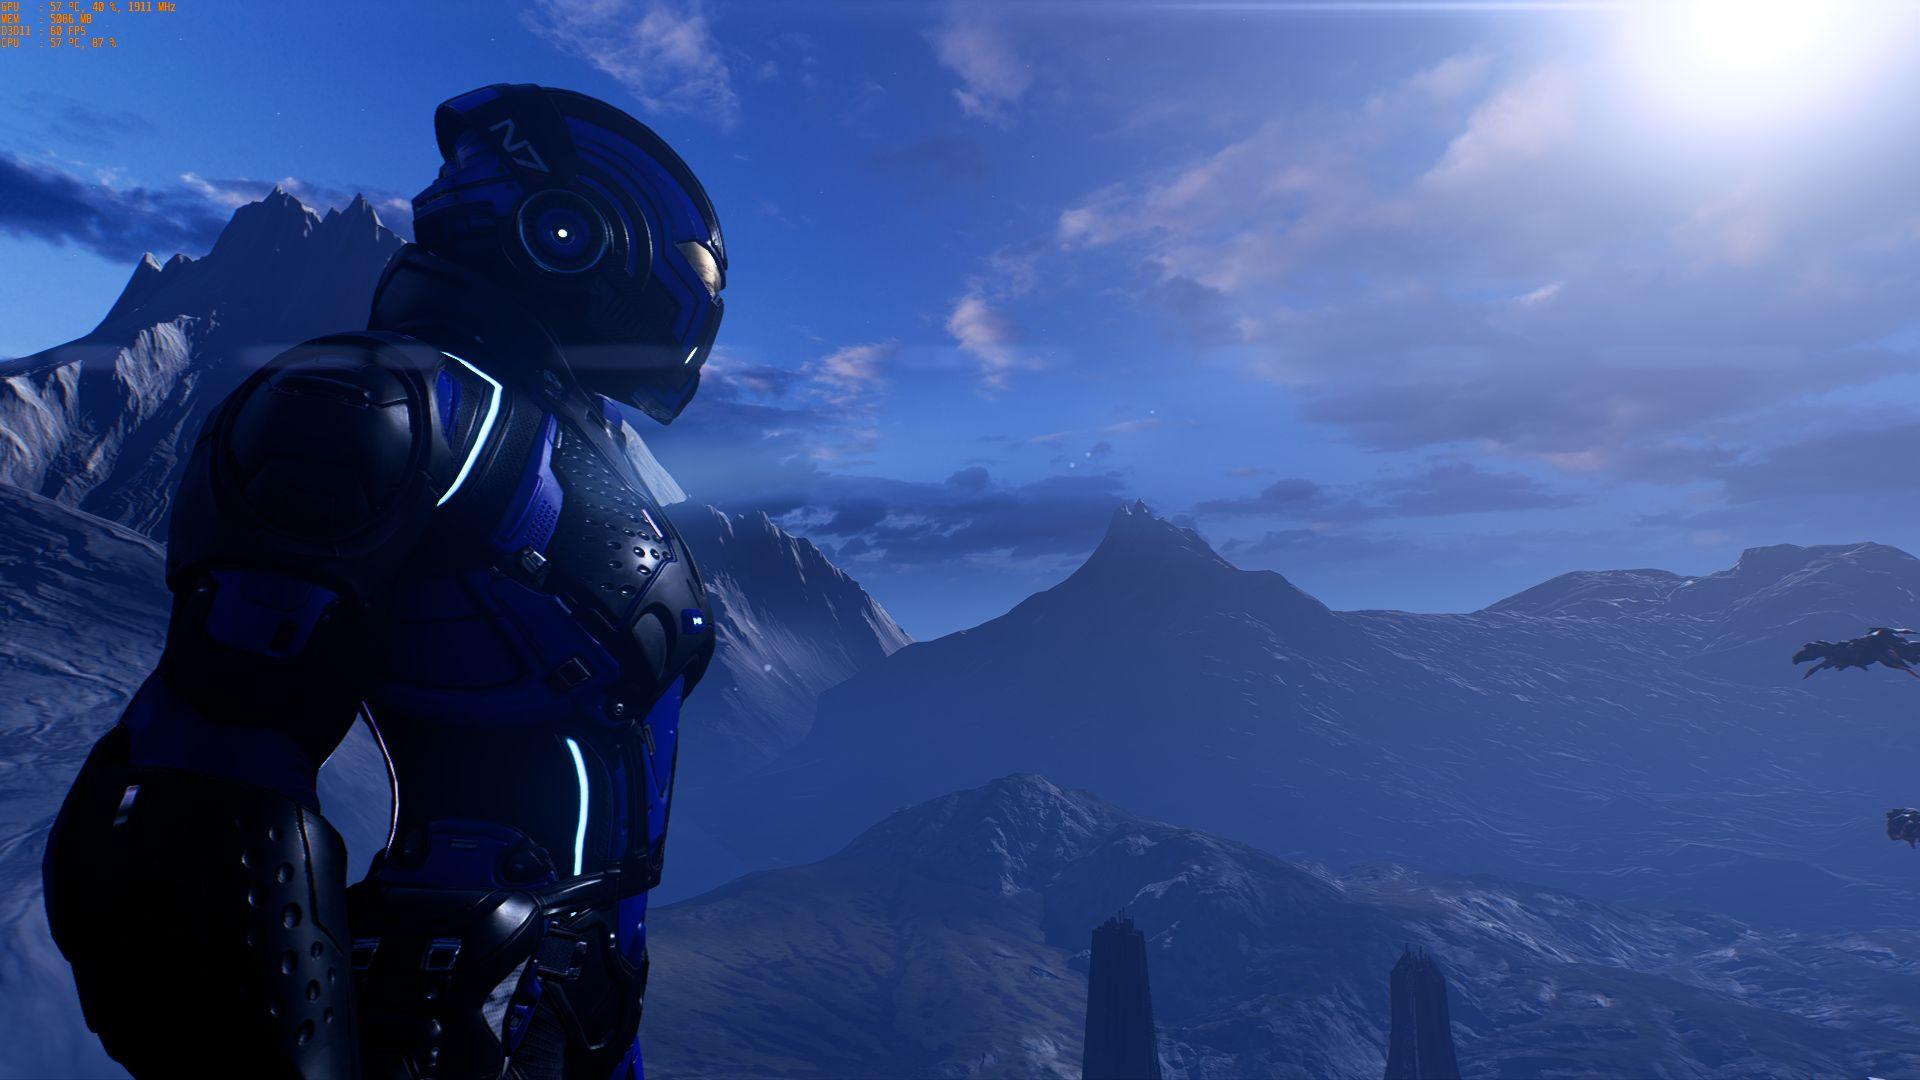 Mass Effect Andromeda Screenshot 2017.07.30 - 18.04.21.01.jpg - Mass Effect: Andromeda